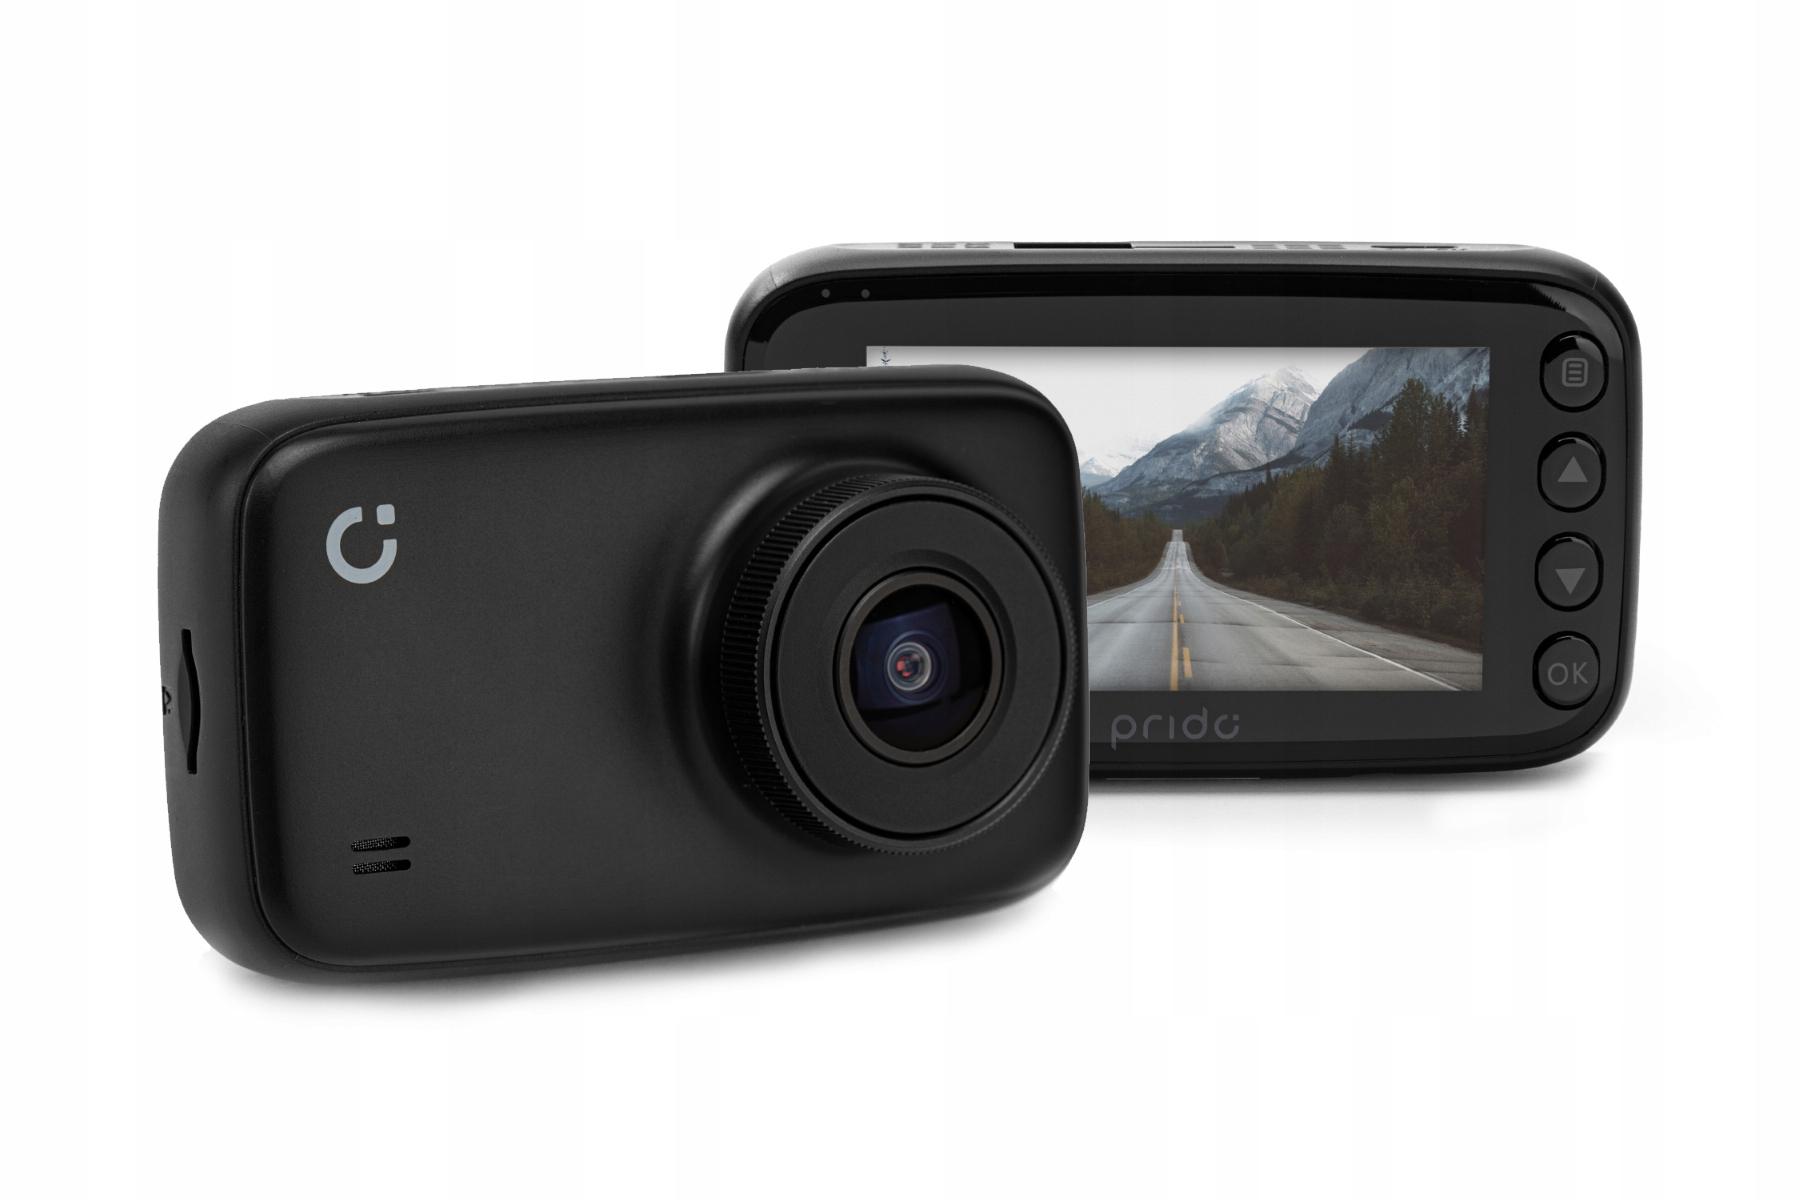 Kamera samochodowa Prido i7 pro 64 Gb